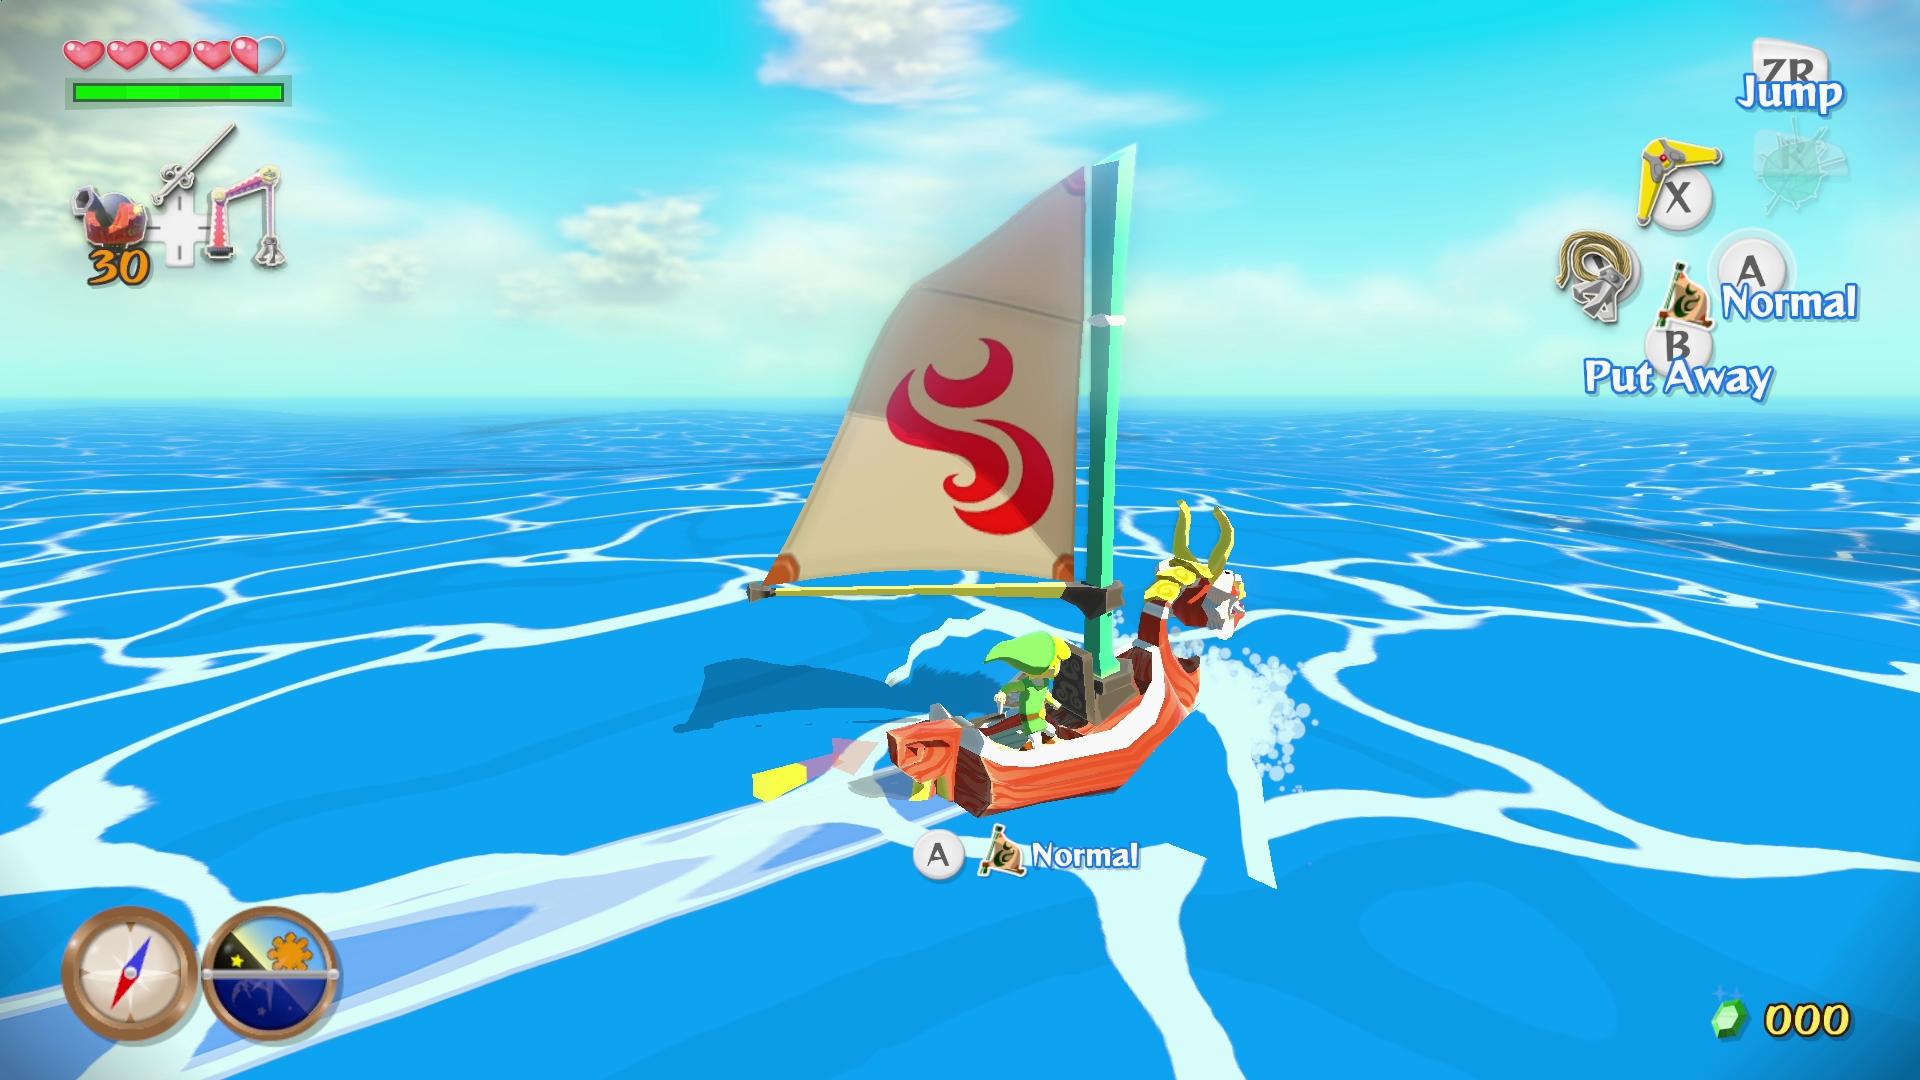 The Legend of Zelda: The Wind Waker HD Screenshot (Photo: Business Wire)